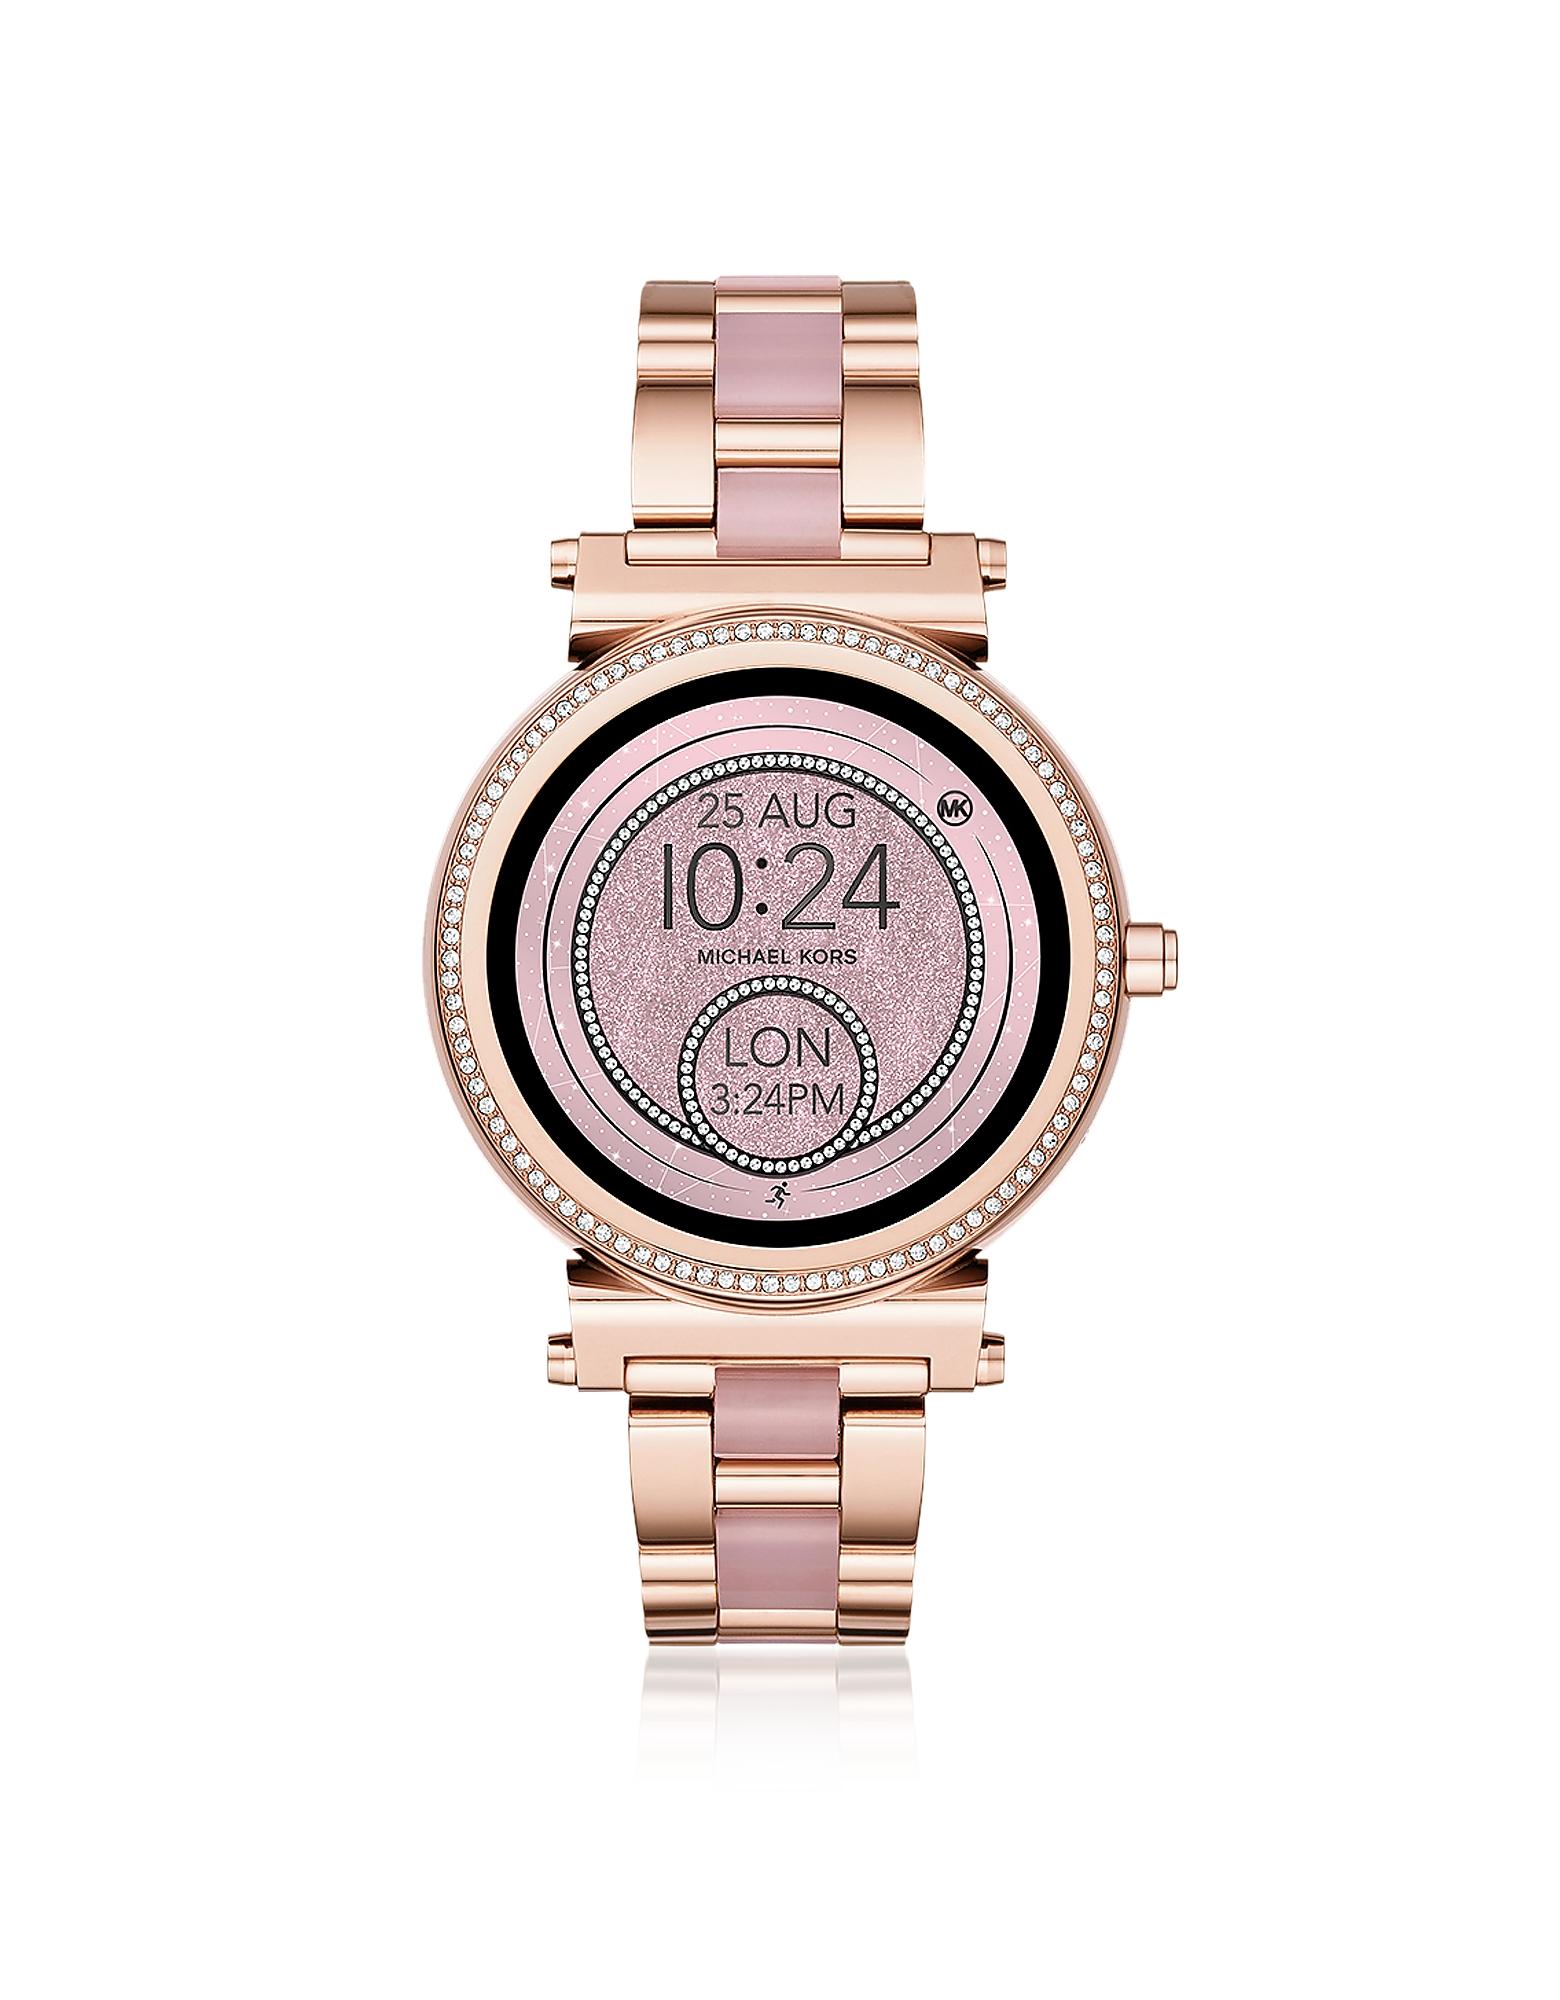 Michael Kors Sofie - Часы Touchscreen Смарт Оттенка Розового Золота с Деталями из Ацетата